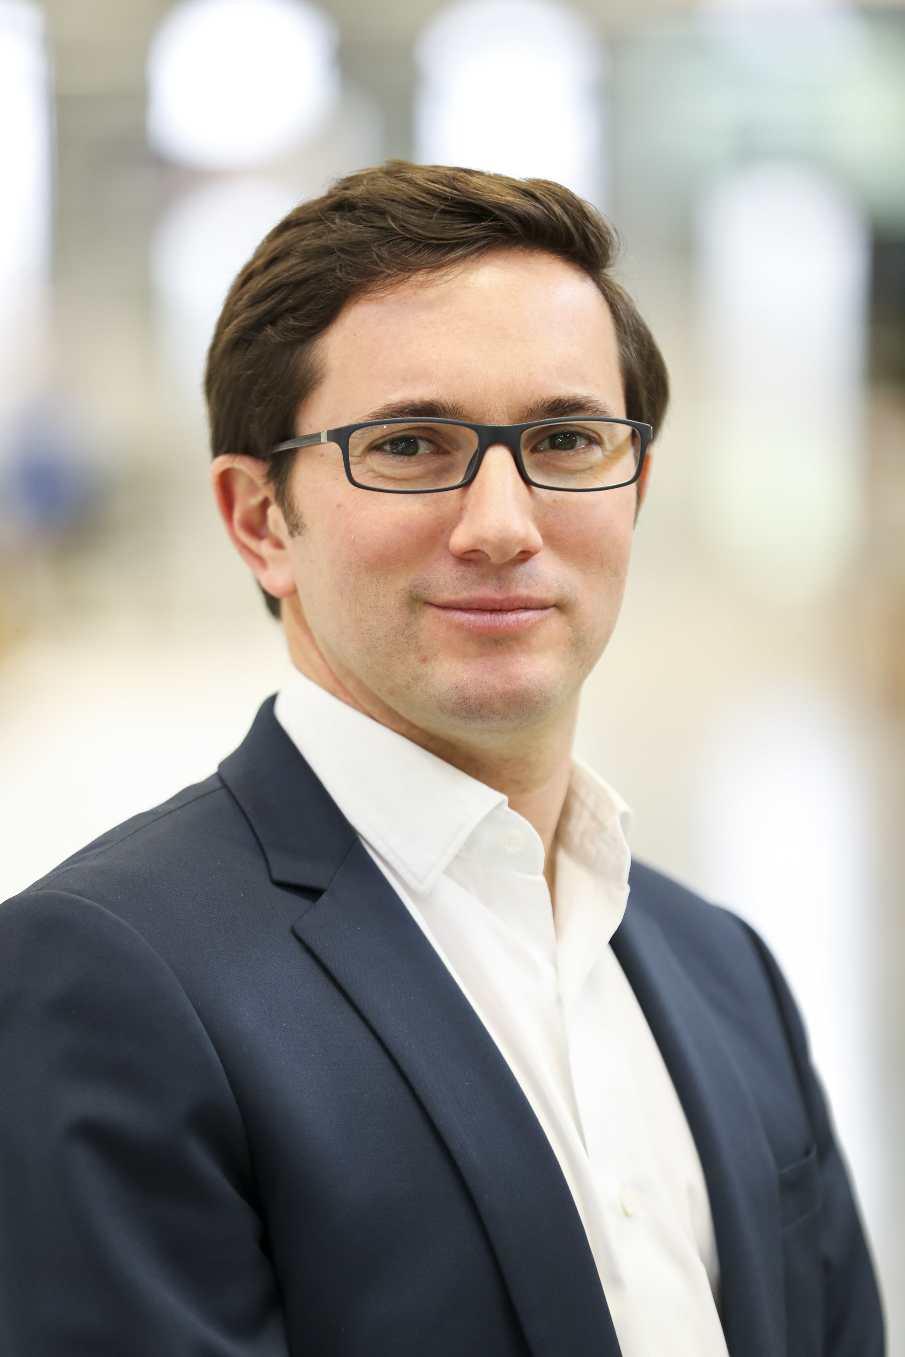 Valentin Safir nommé président de Safran Engineering Services